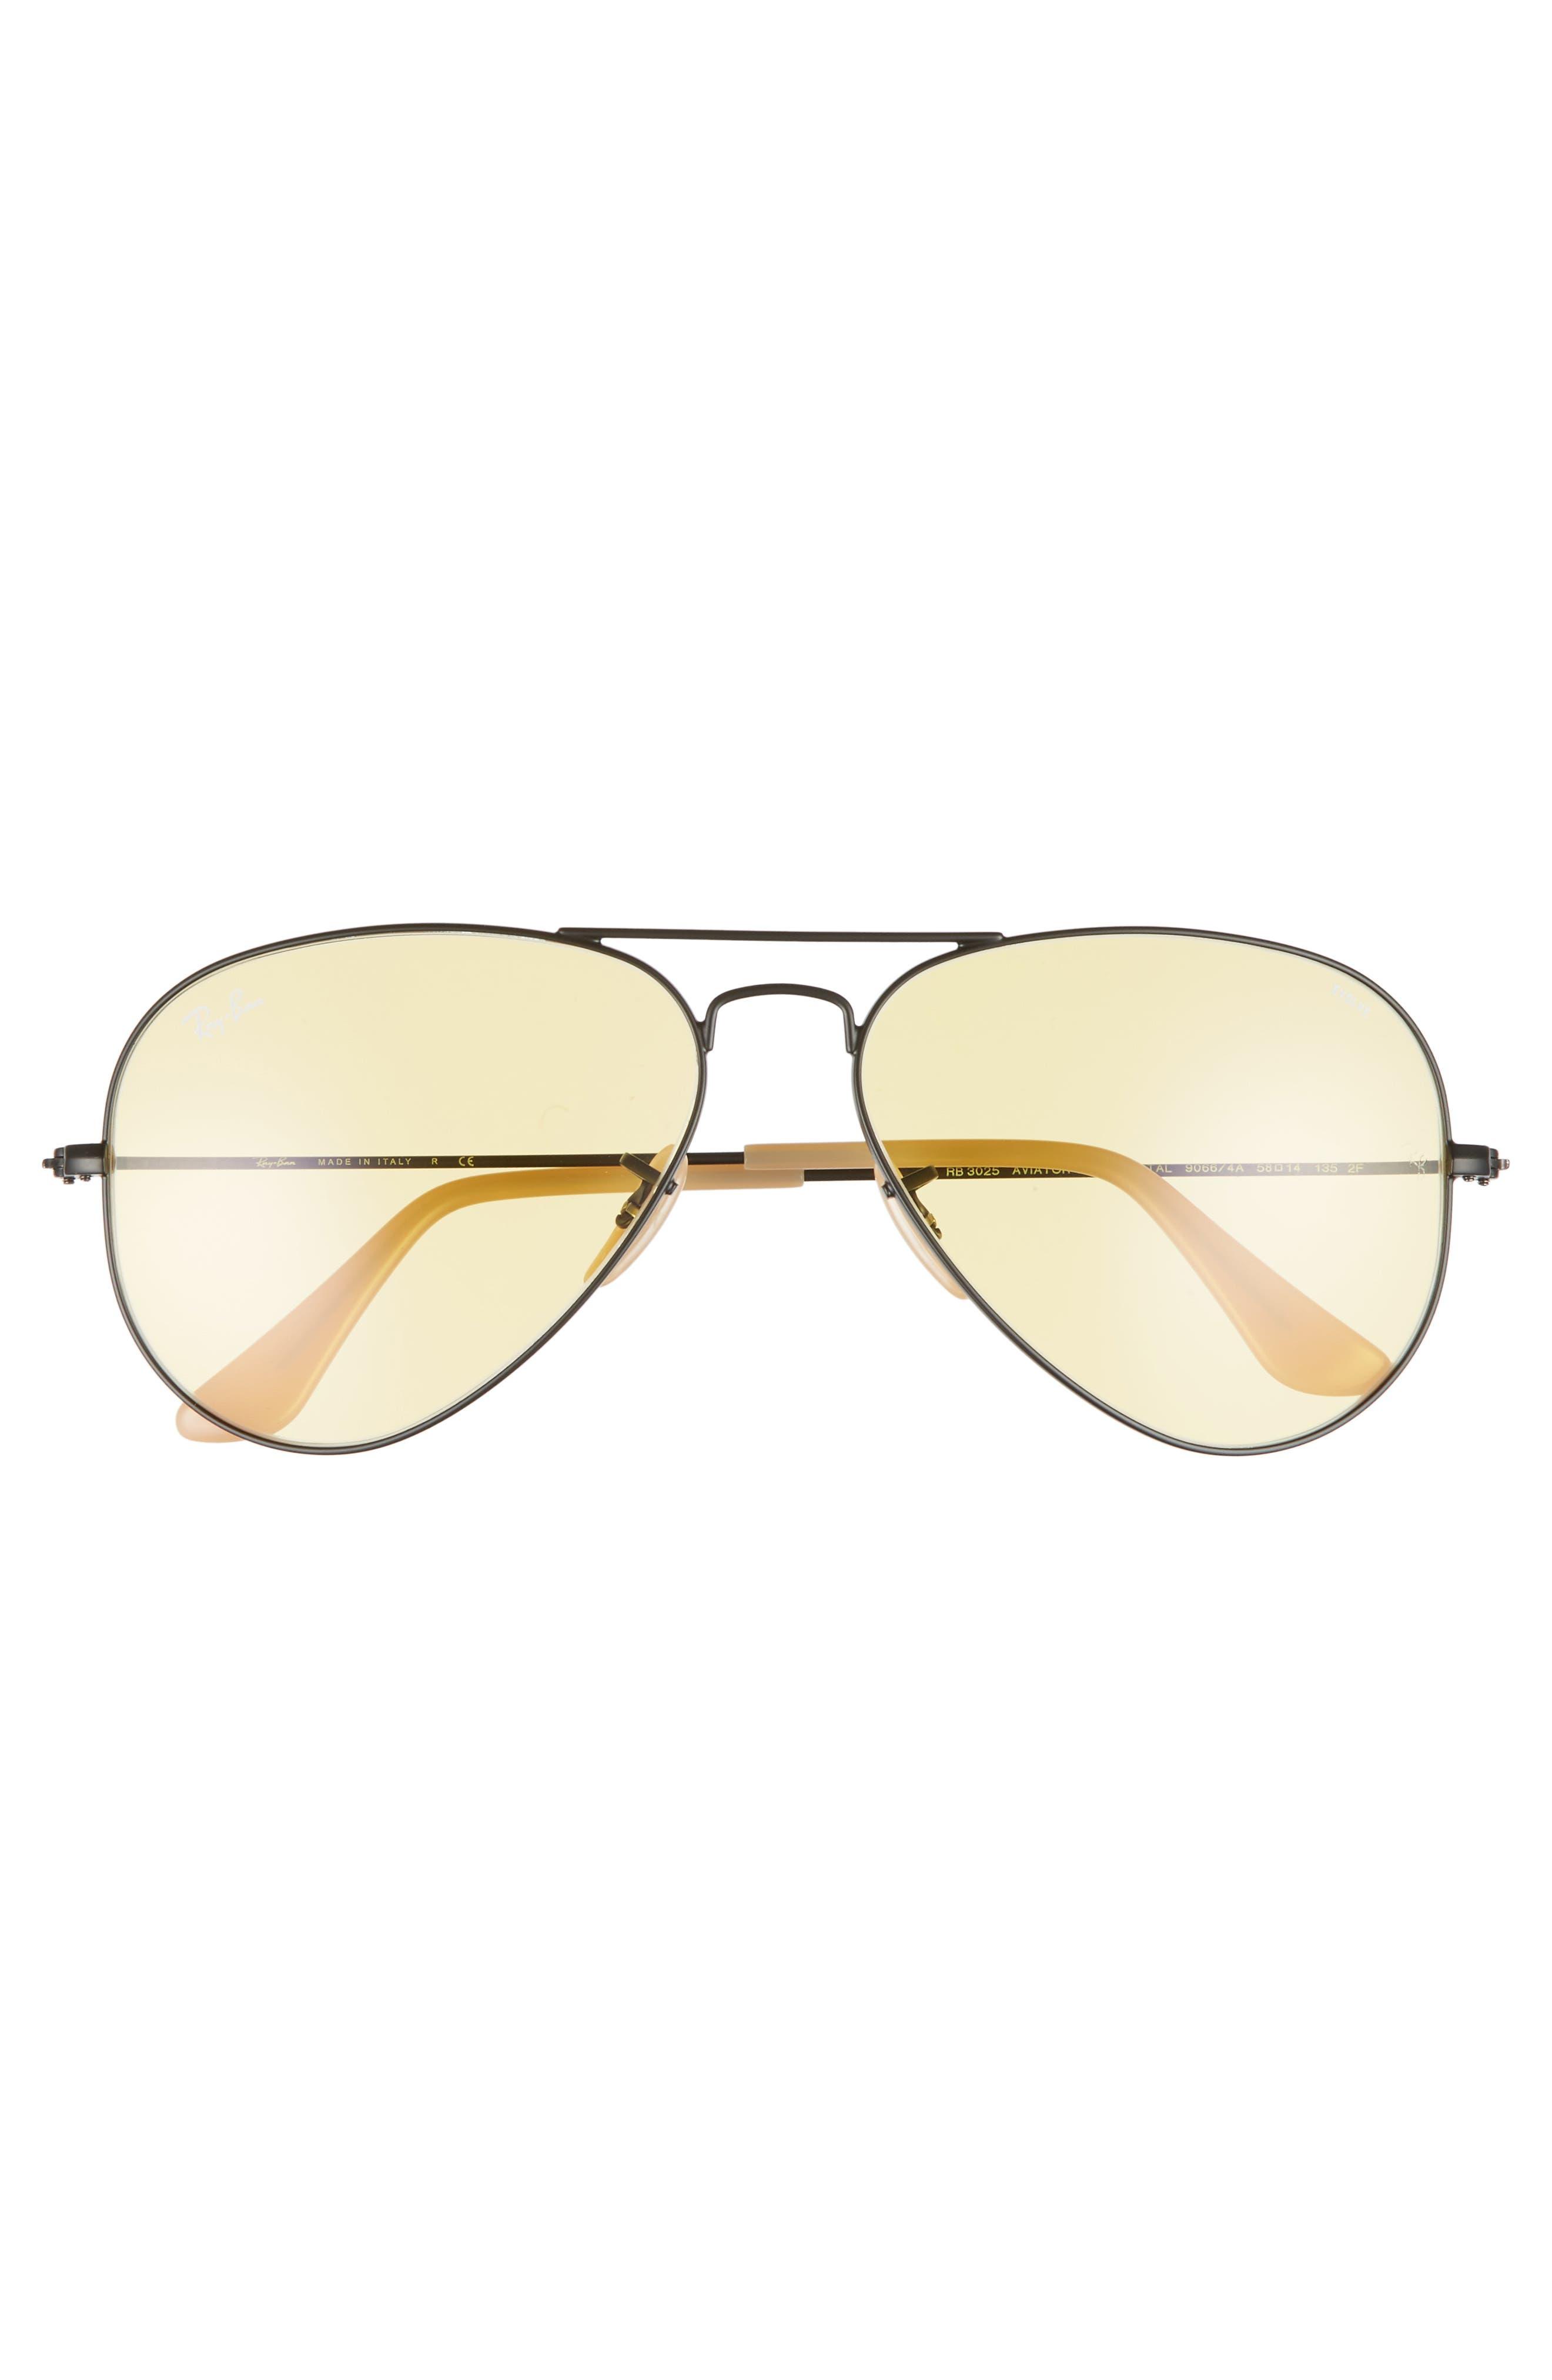 Evolve 58mm Polarized Aviator Sunglasses,                             Alternate thumbnail 2, color,                             Black